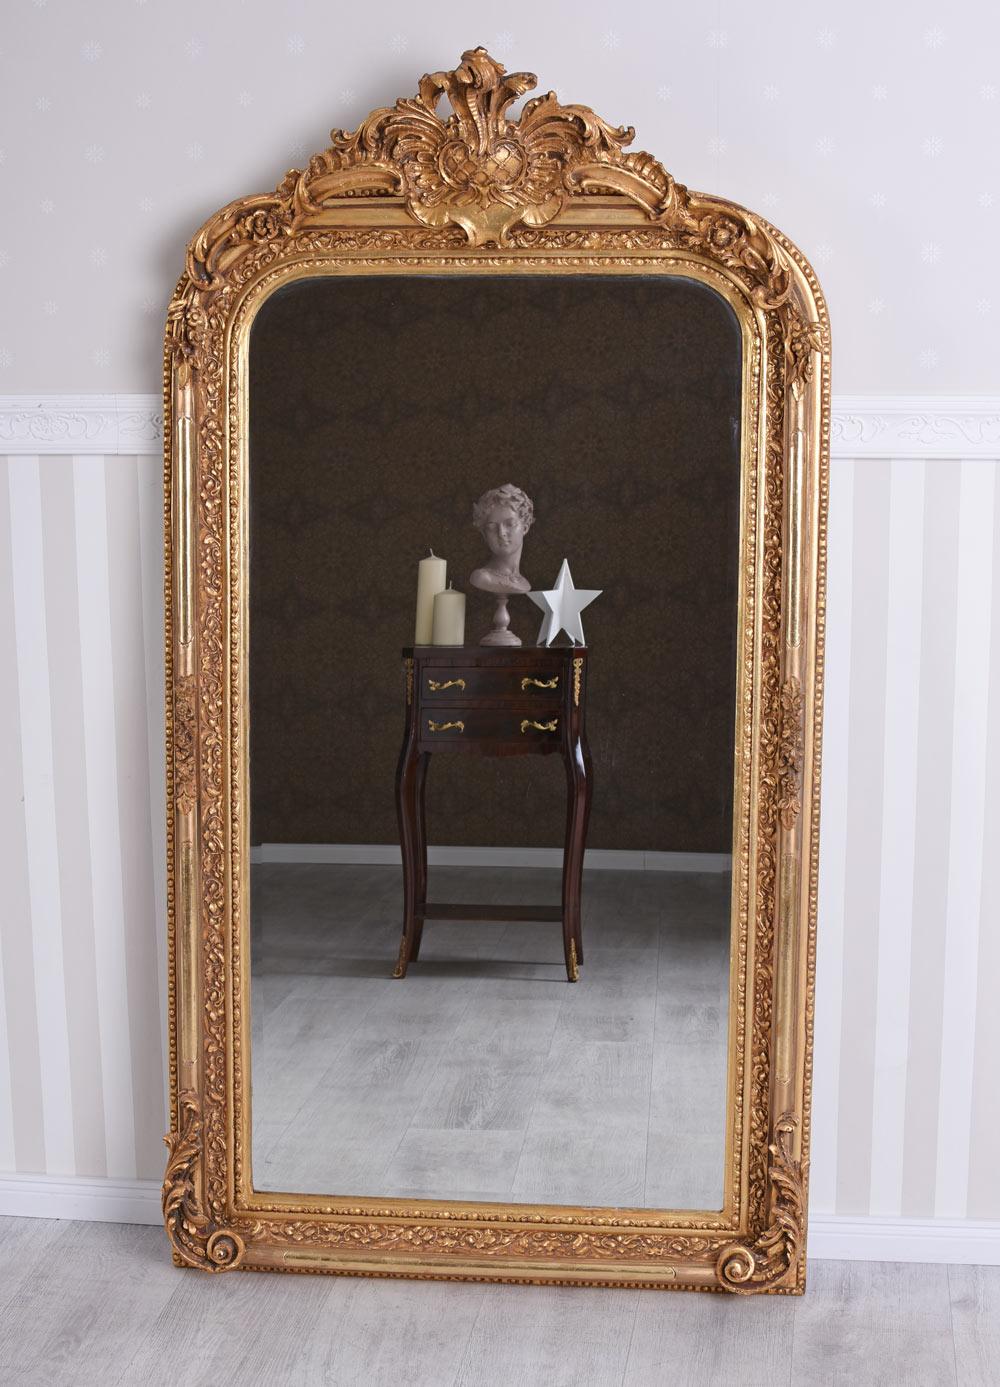 Miroir baroque mural de chemin e pleine longueur ancien ebay for Miroir mural baroque